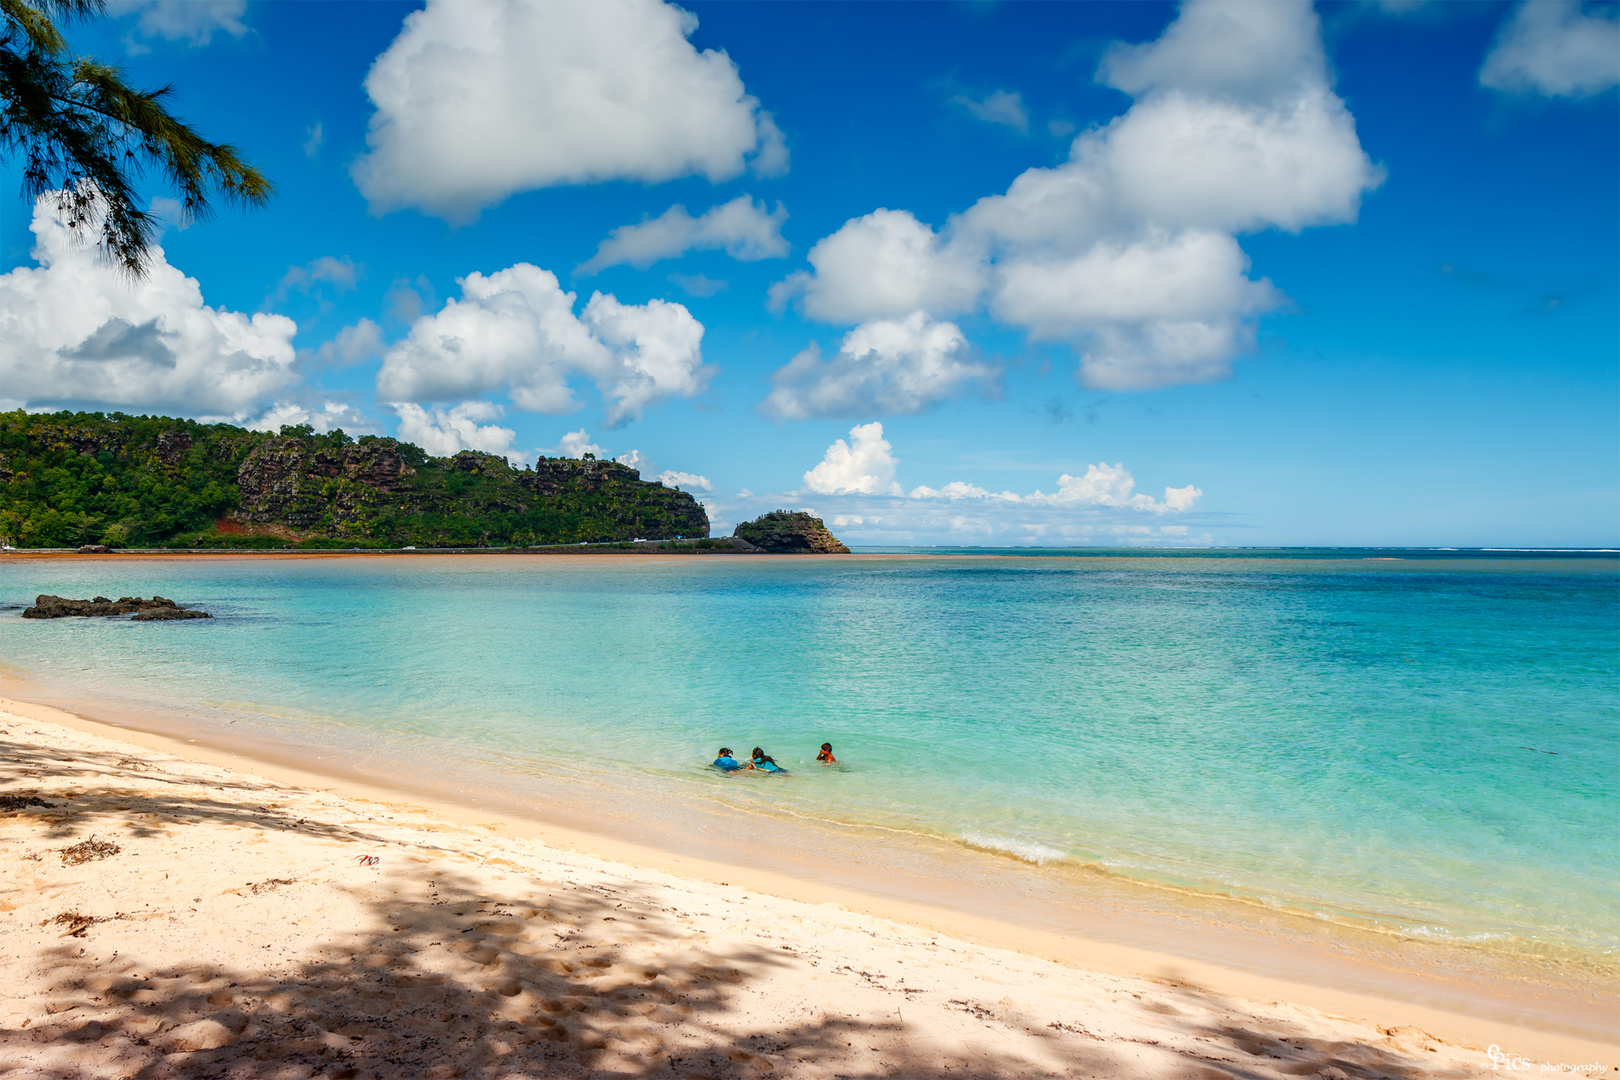 sonne meer strand spass foto & bild | mauritius, beach